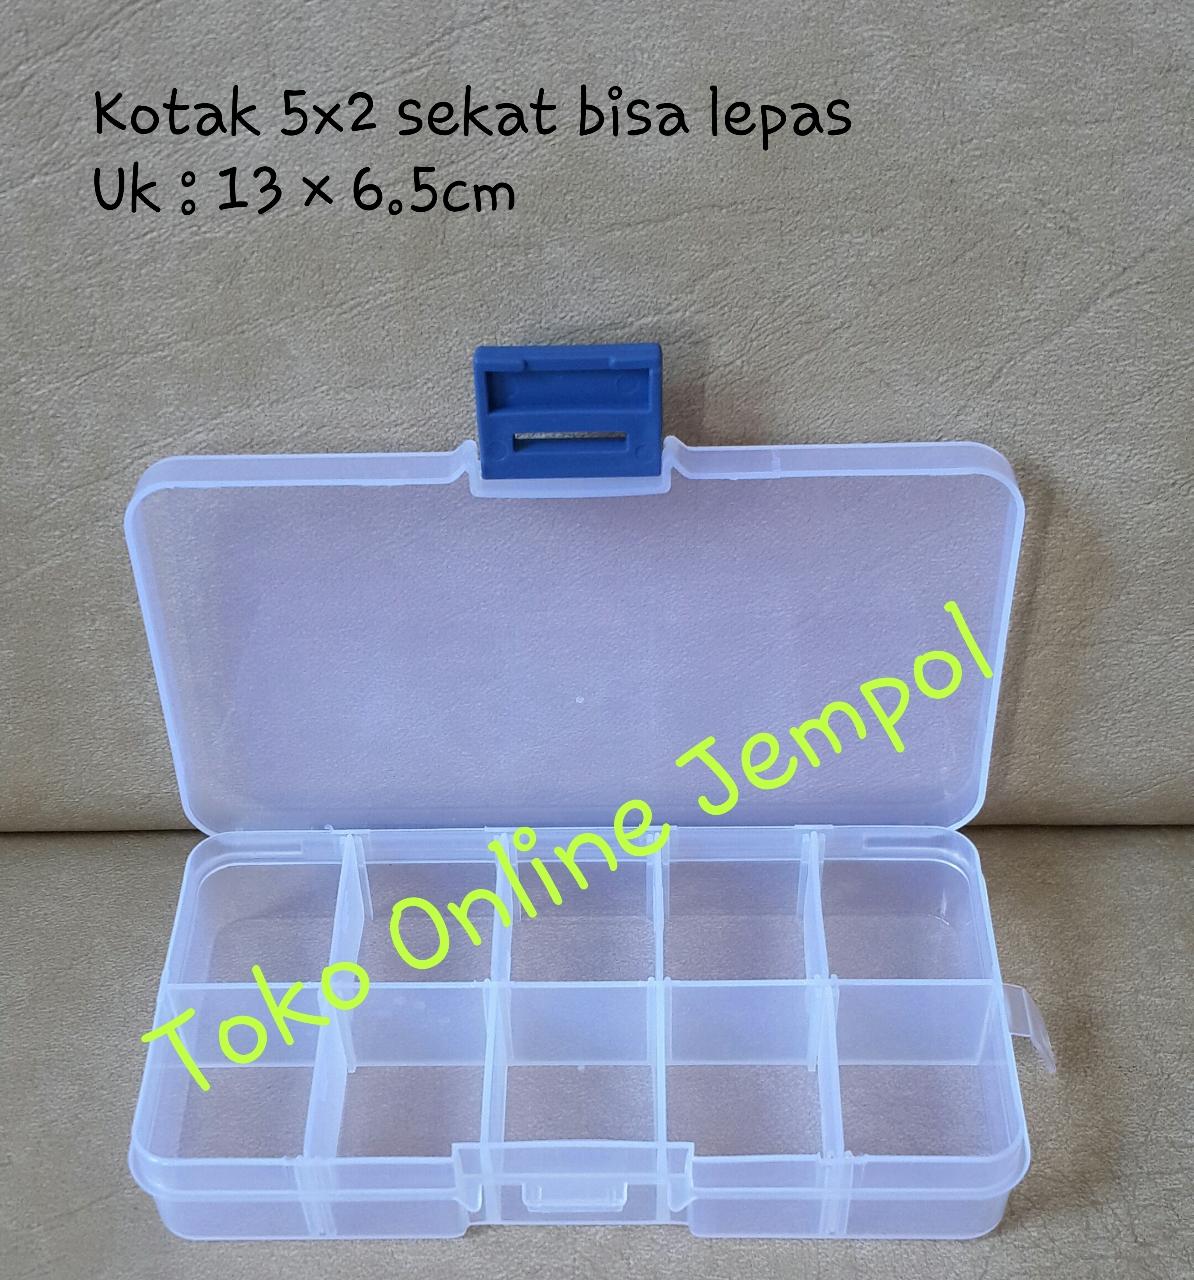 Kain Kotak Penyimpanan Kecil Kotak Penyimpanan Kotak